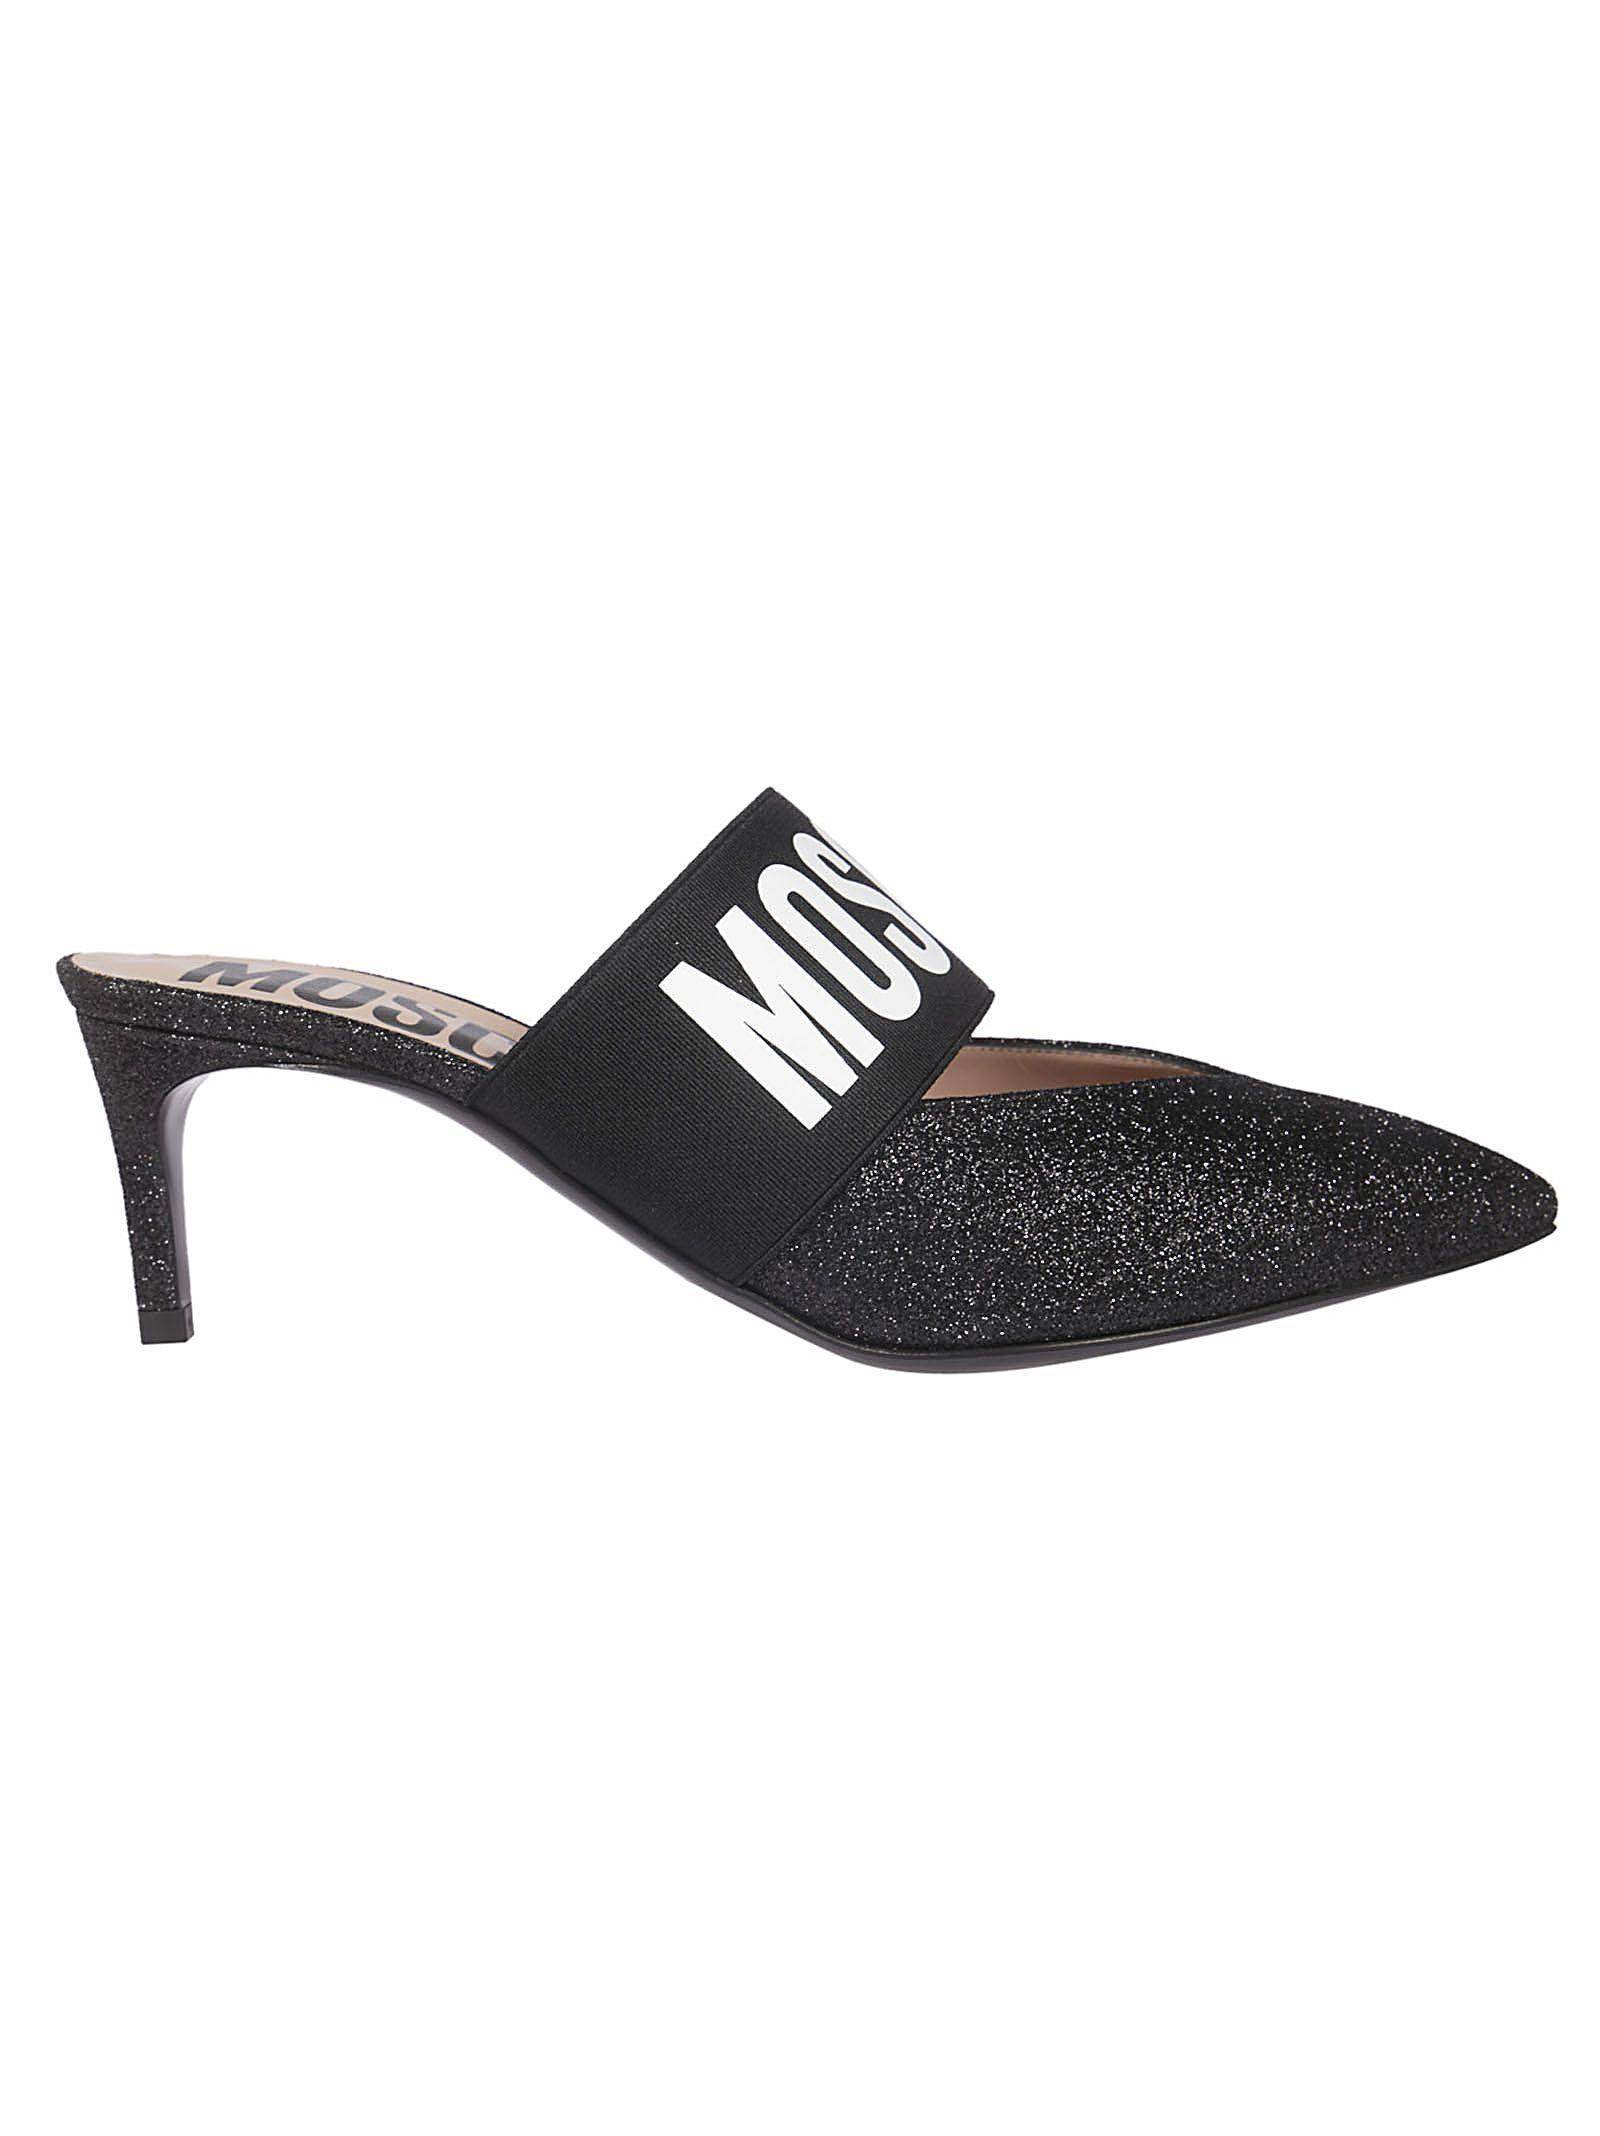 d15c19b22175 MOSCHINO GLITTERY COATED MULES.  moschino  shoes